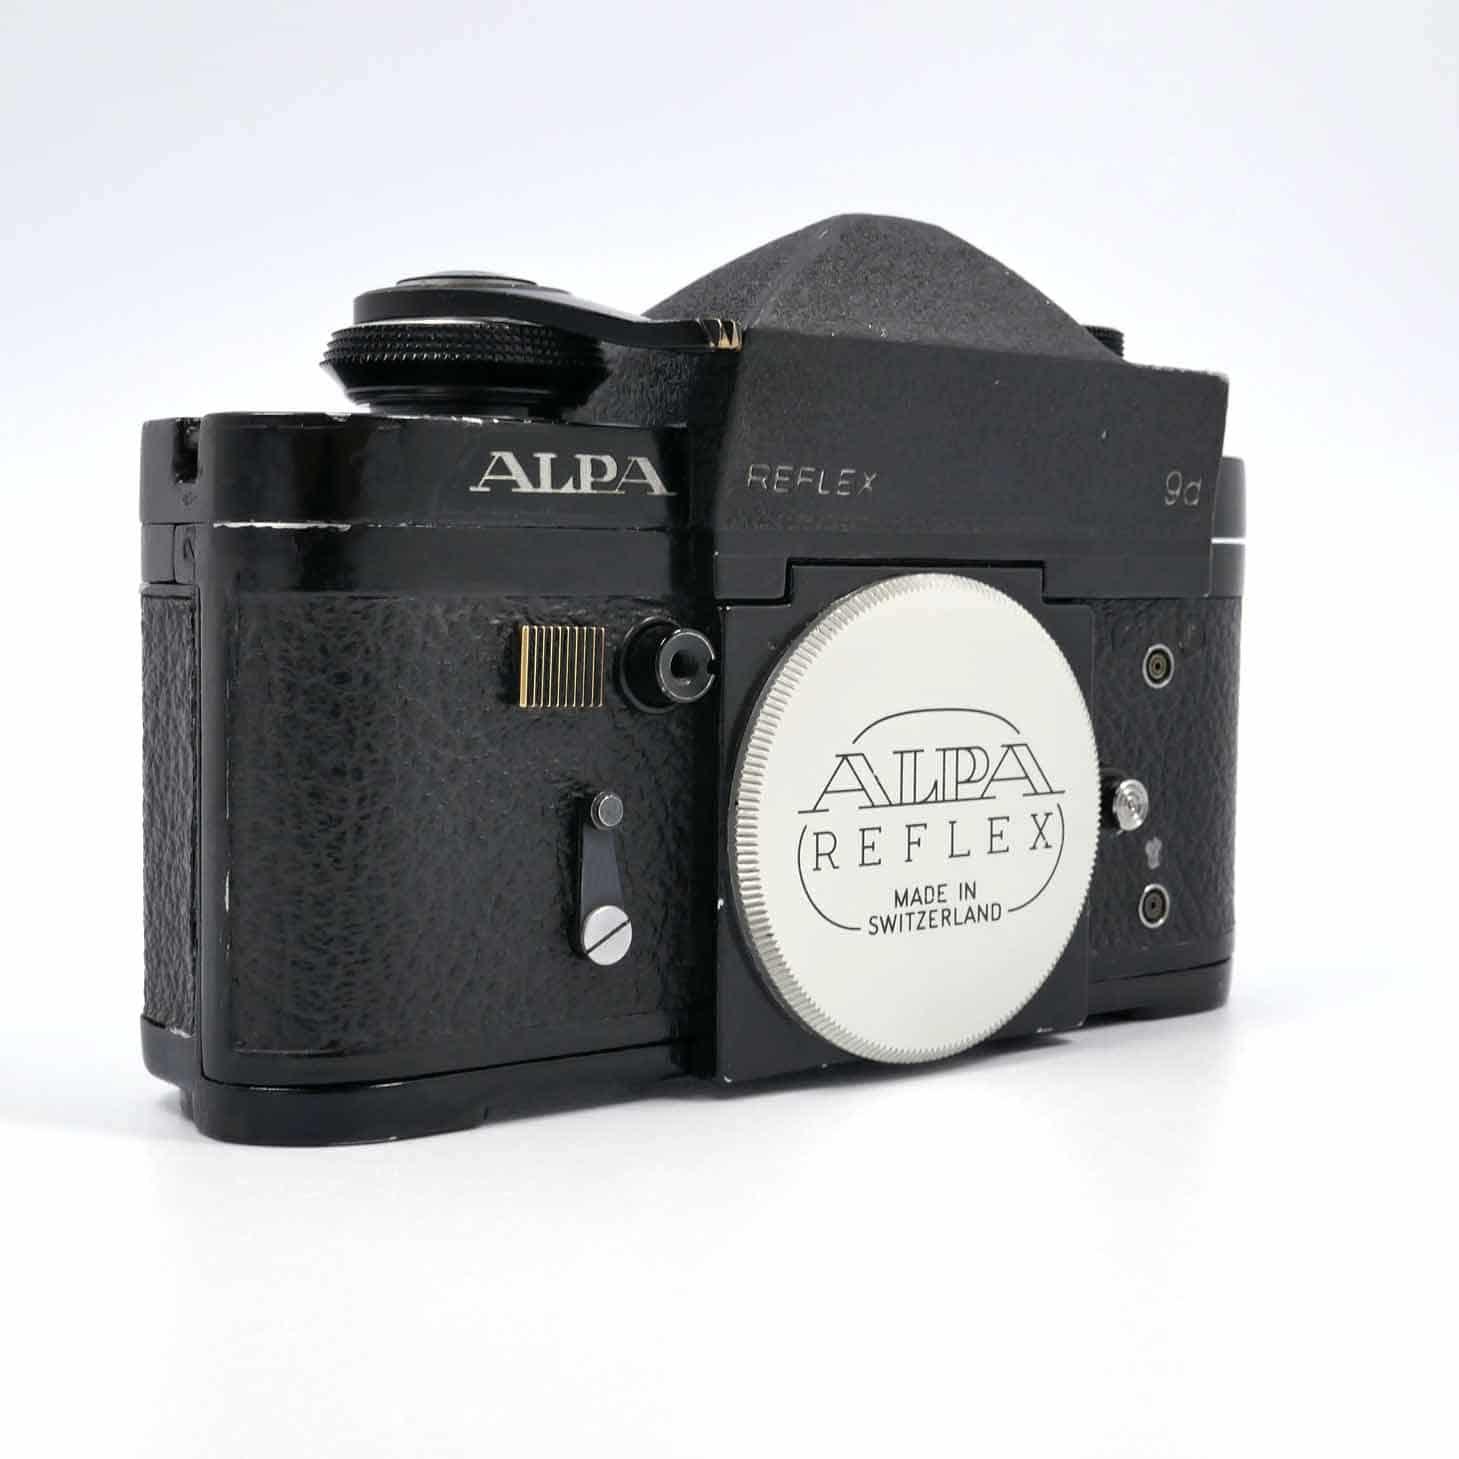 clean-cameras-Alpa-9d-Body-black-11